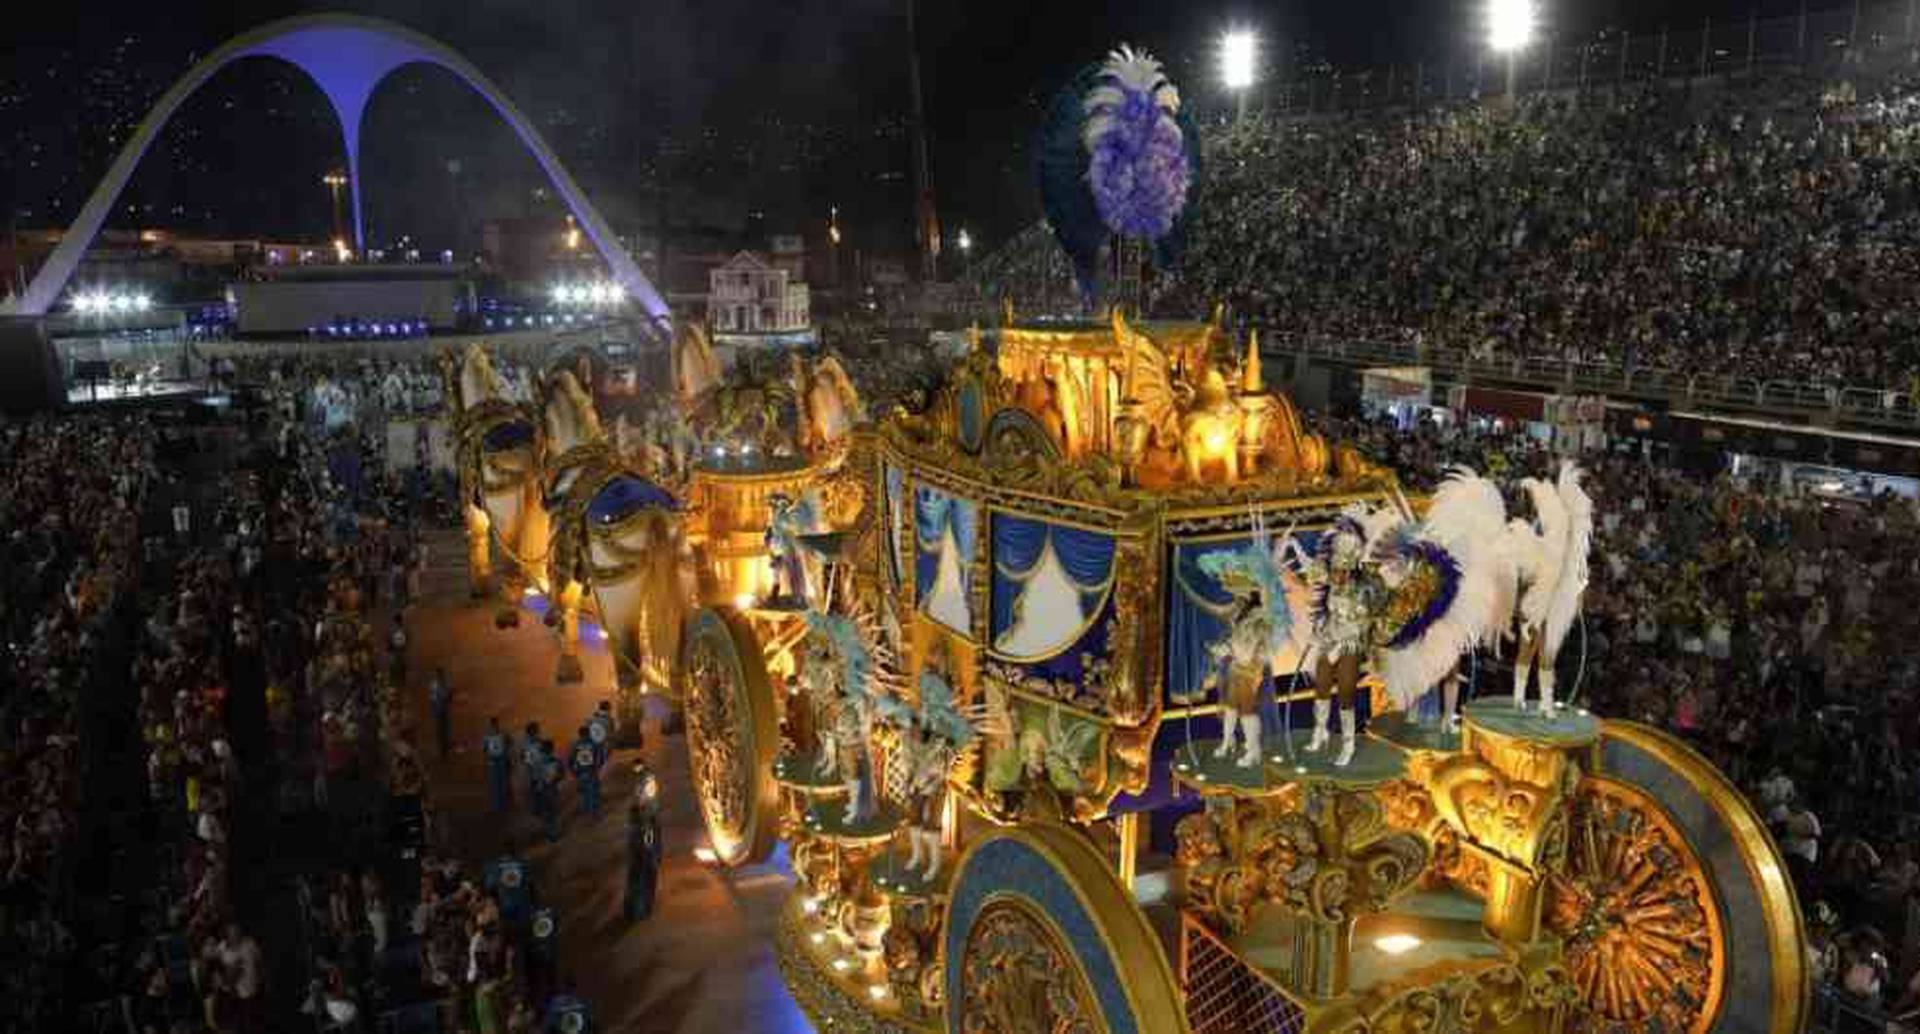 Las alternativas que busca Rio de Janeiro para realizar su tradicional festival